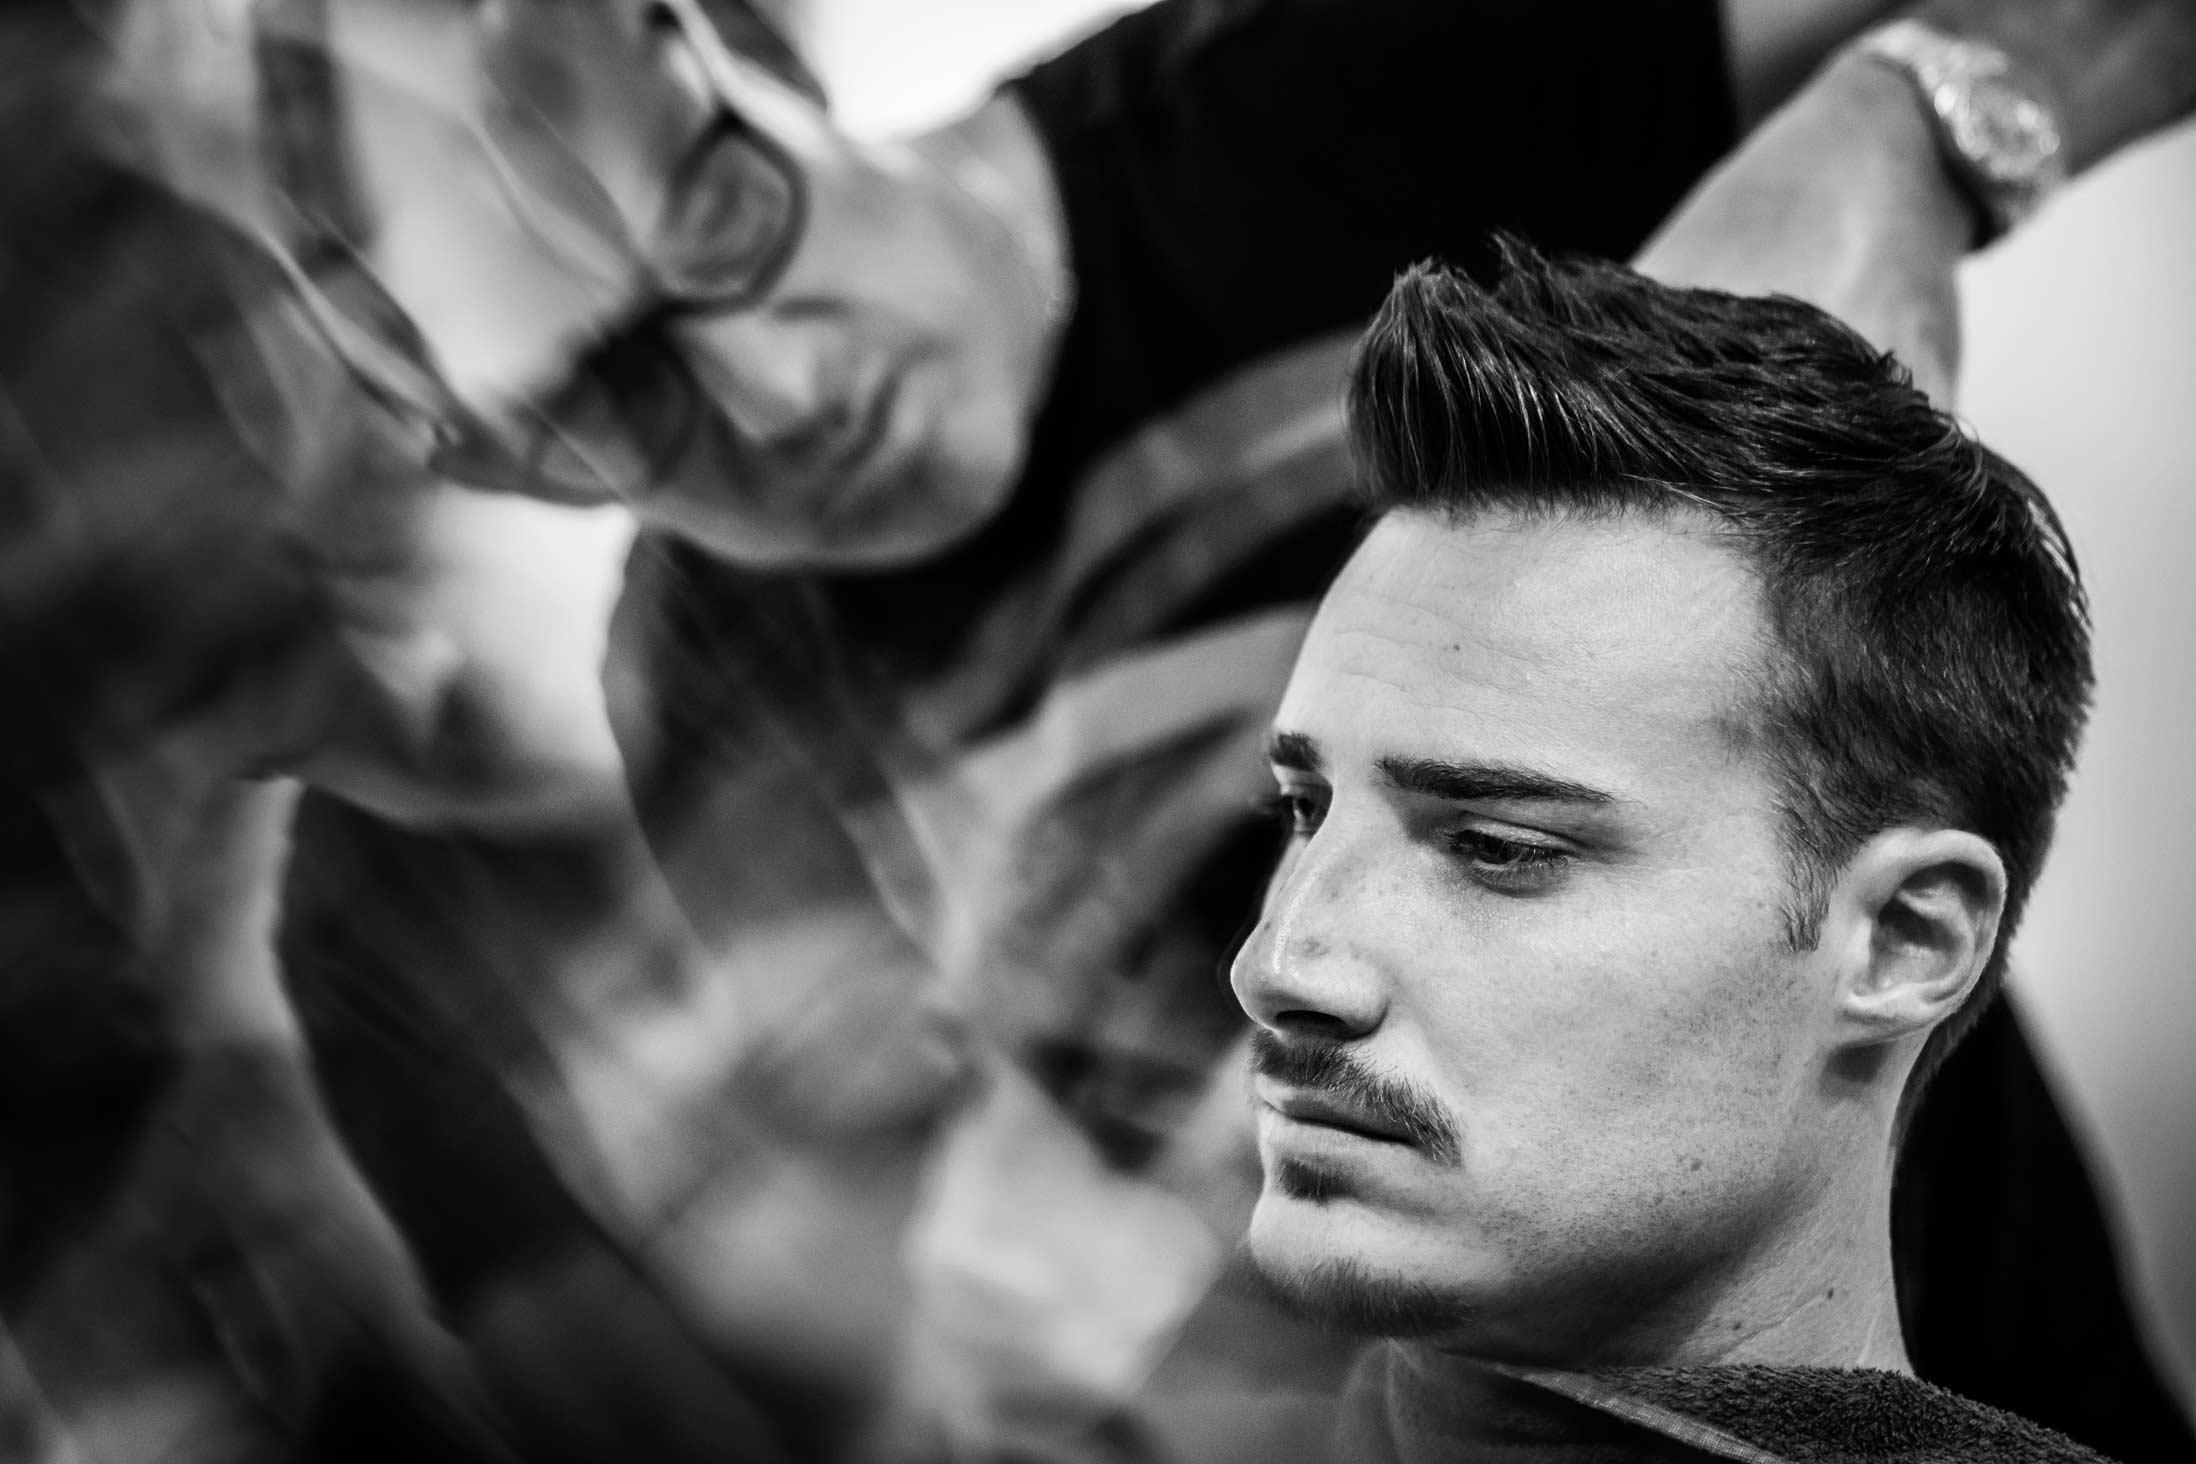 Wedding-Photographer-in-Italy-Documentary-Wedding-Photography-Groom